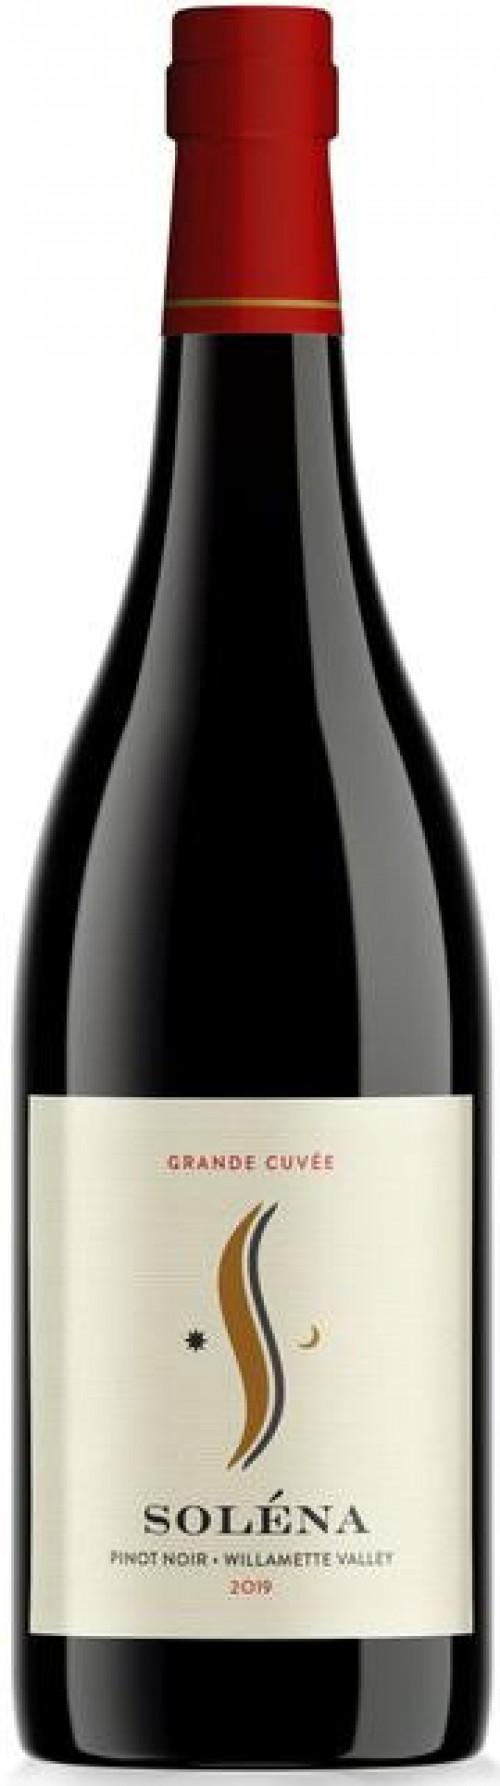 Solena Grande Cuvee Pinot Noir Willamette Valley 750ml